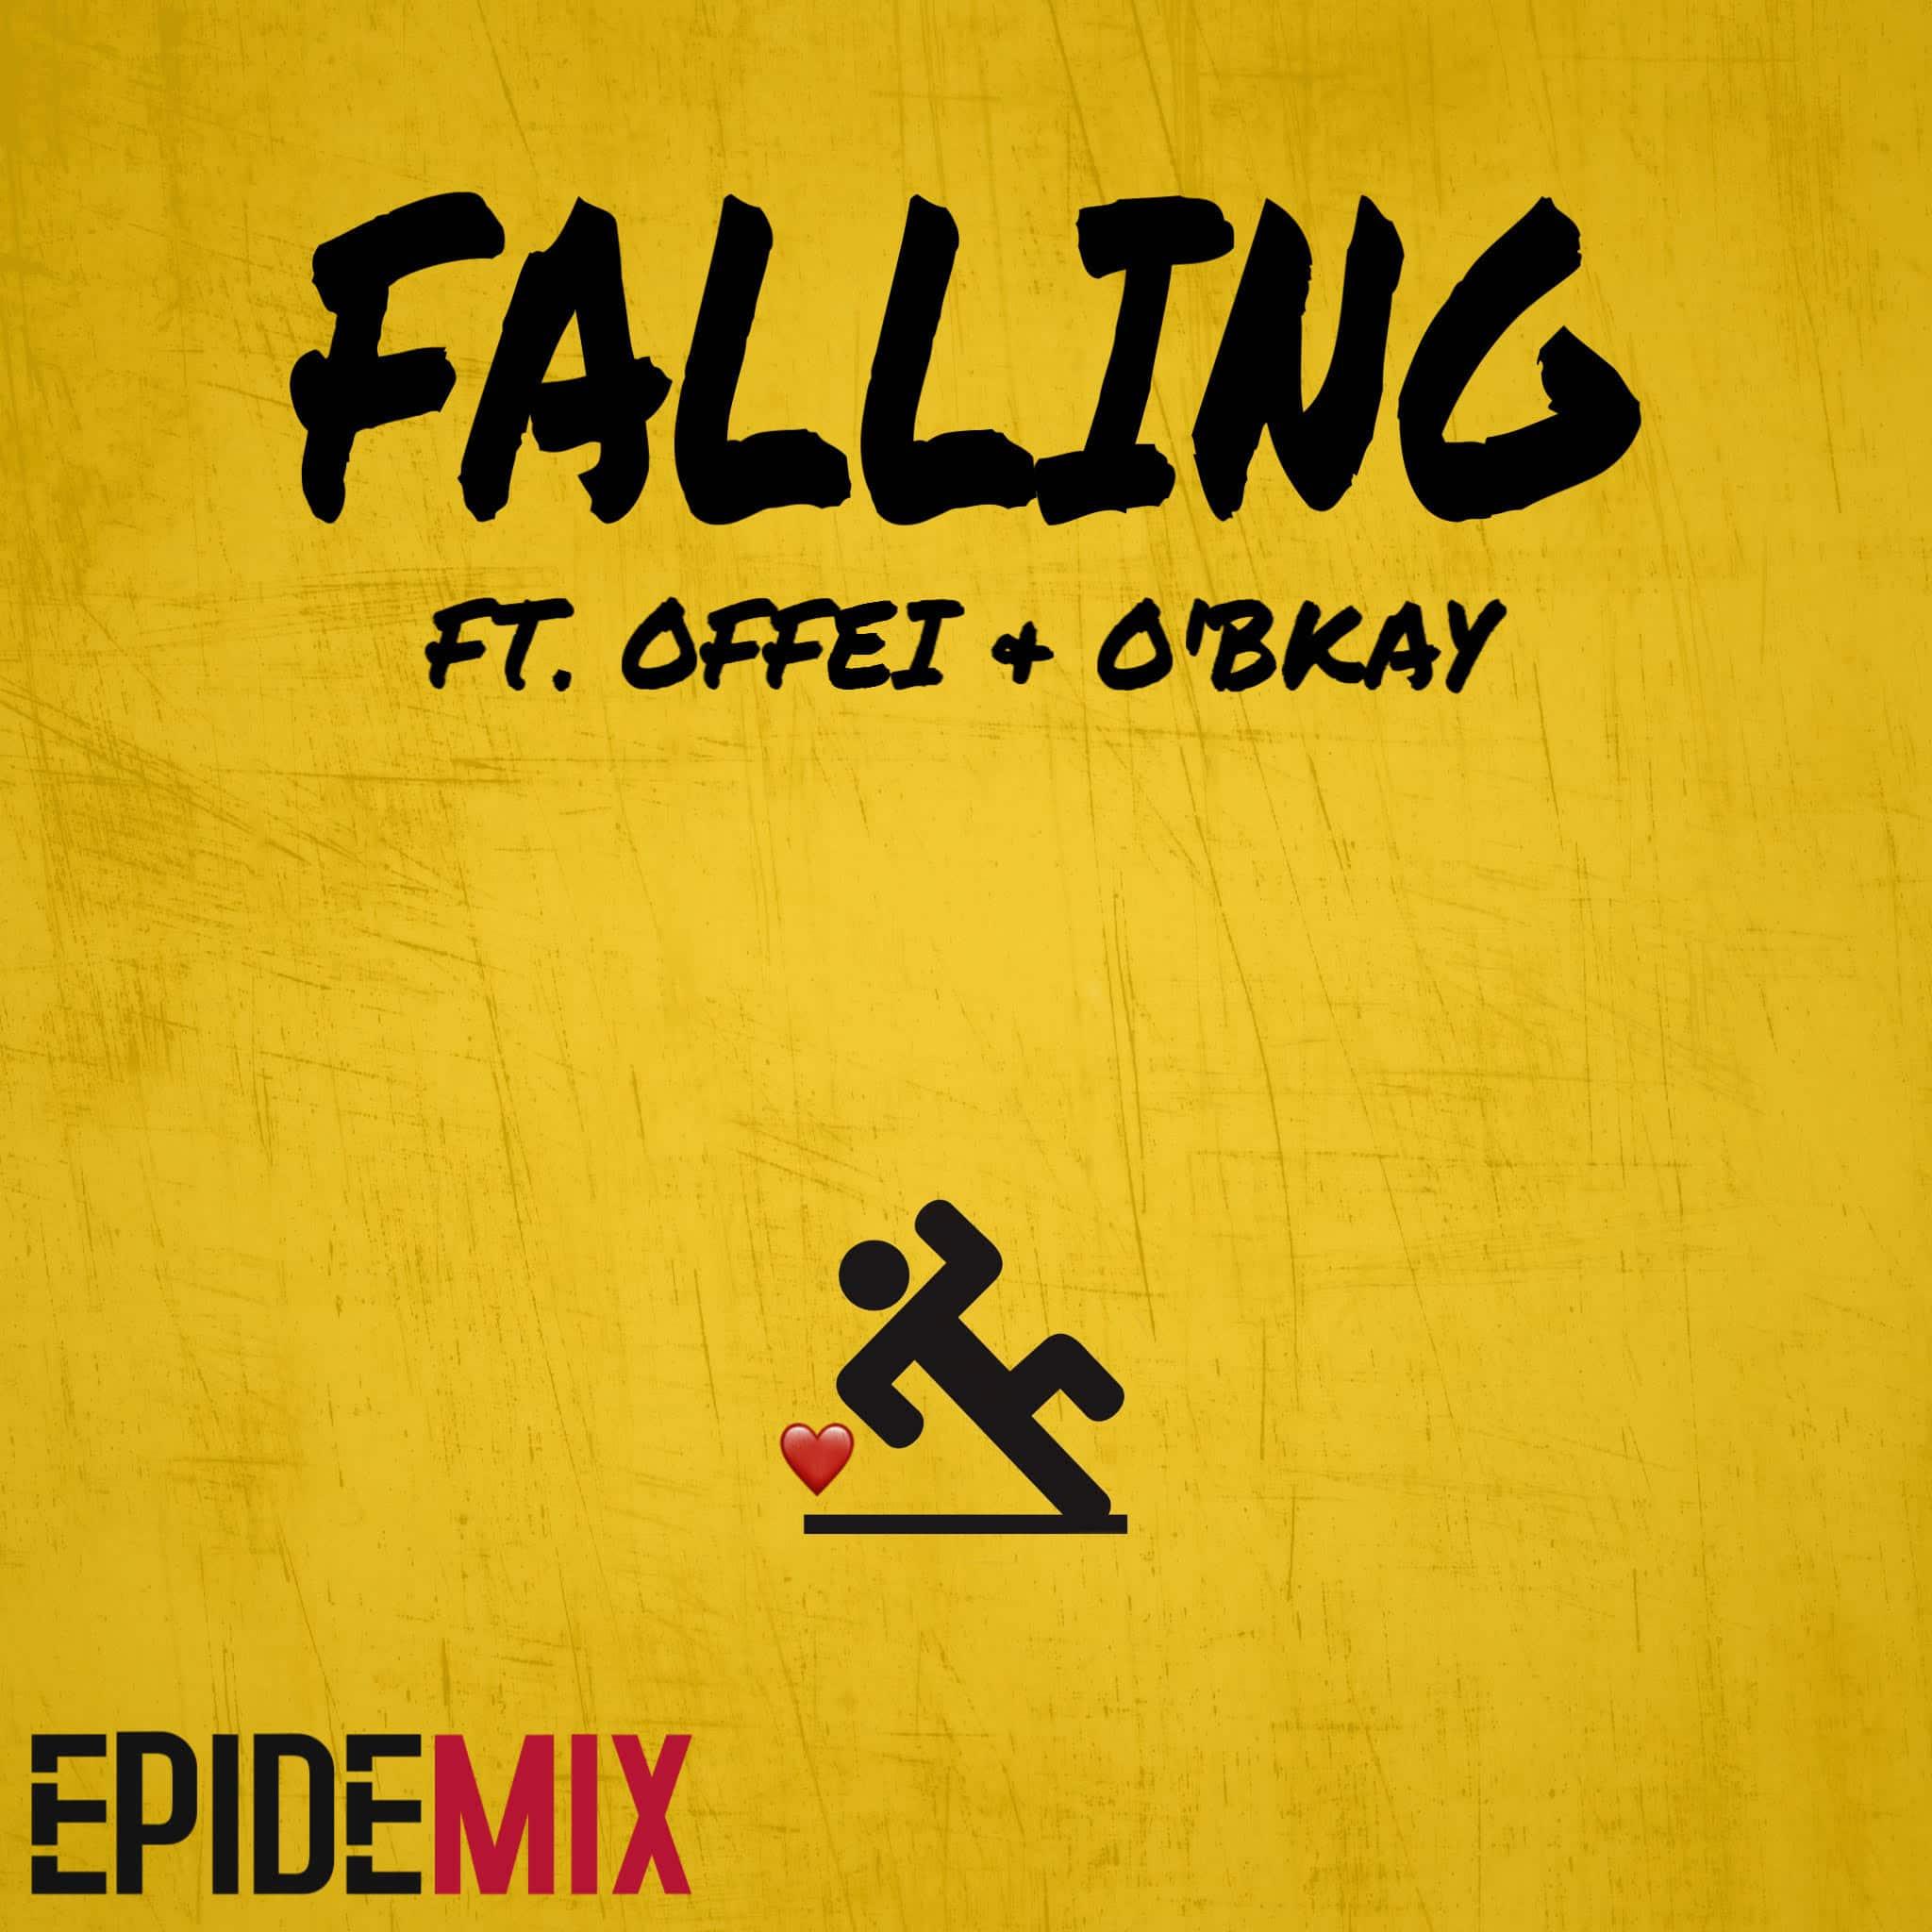 Epidemix – Falling (feat. Offei & O'bkay)